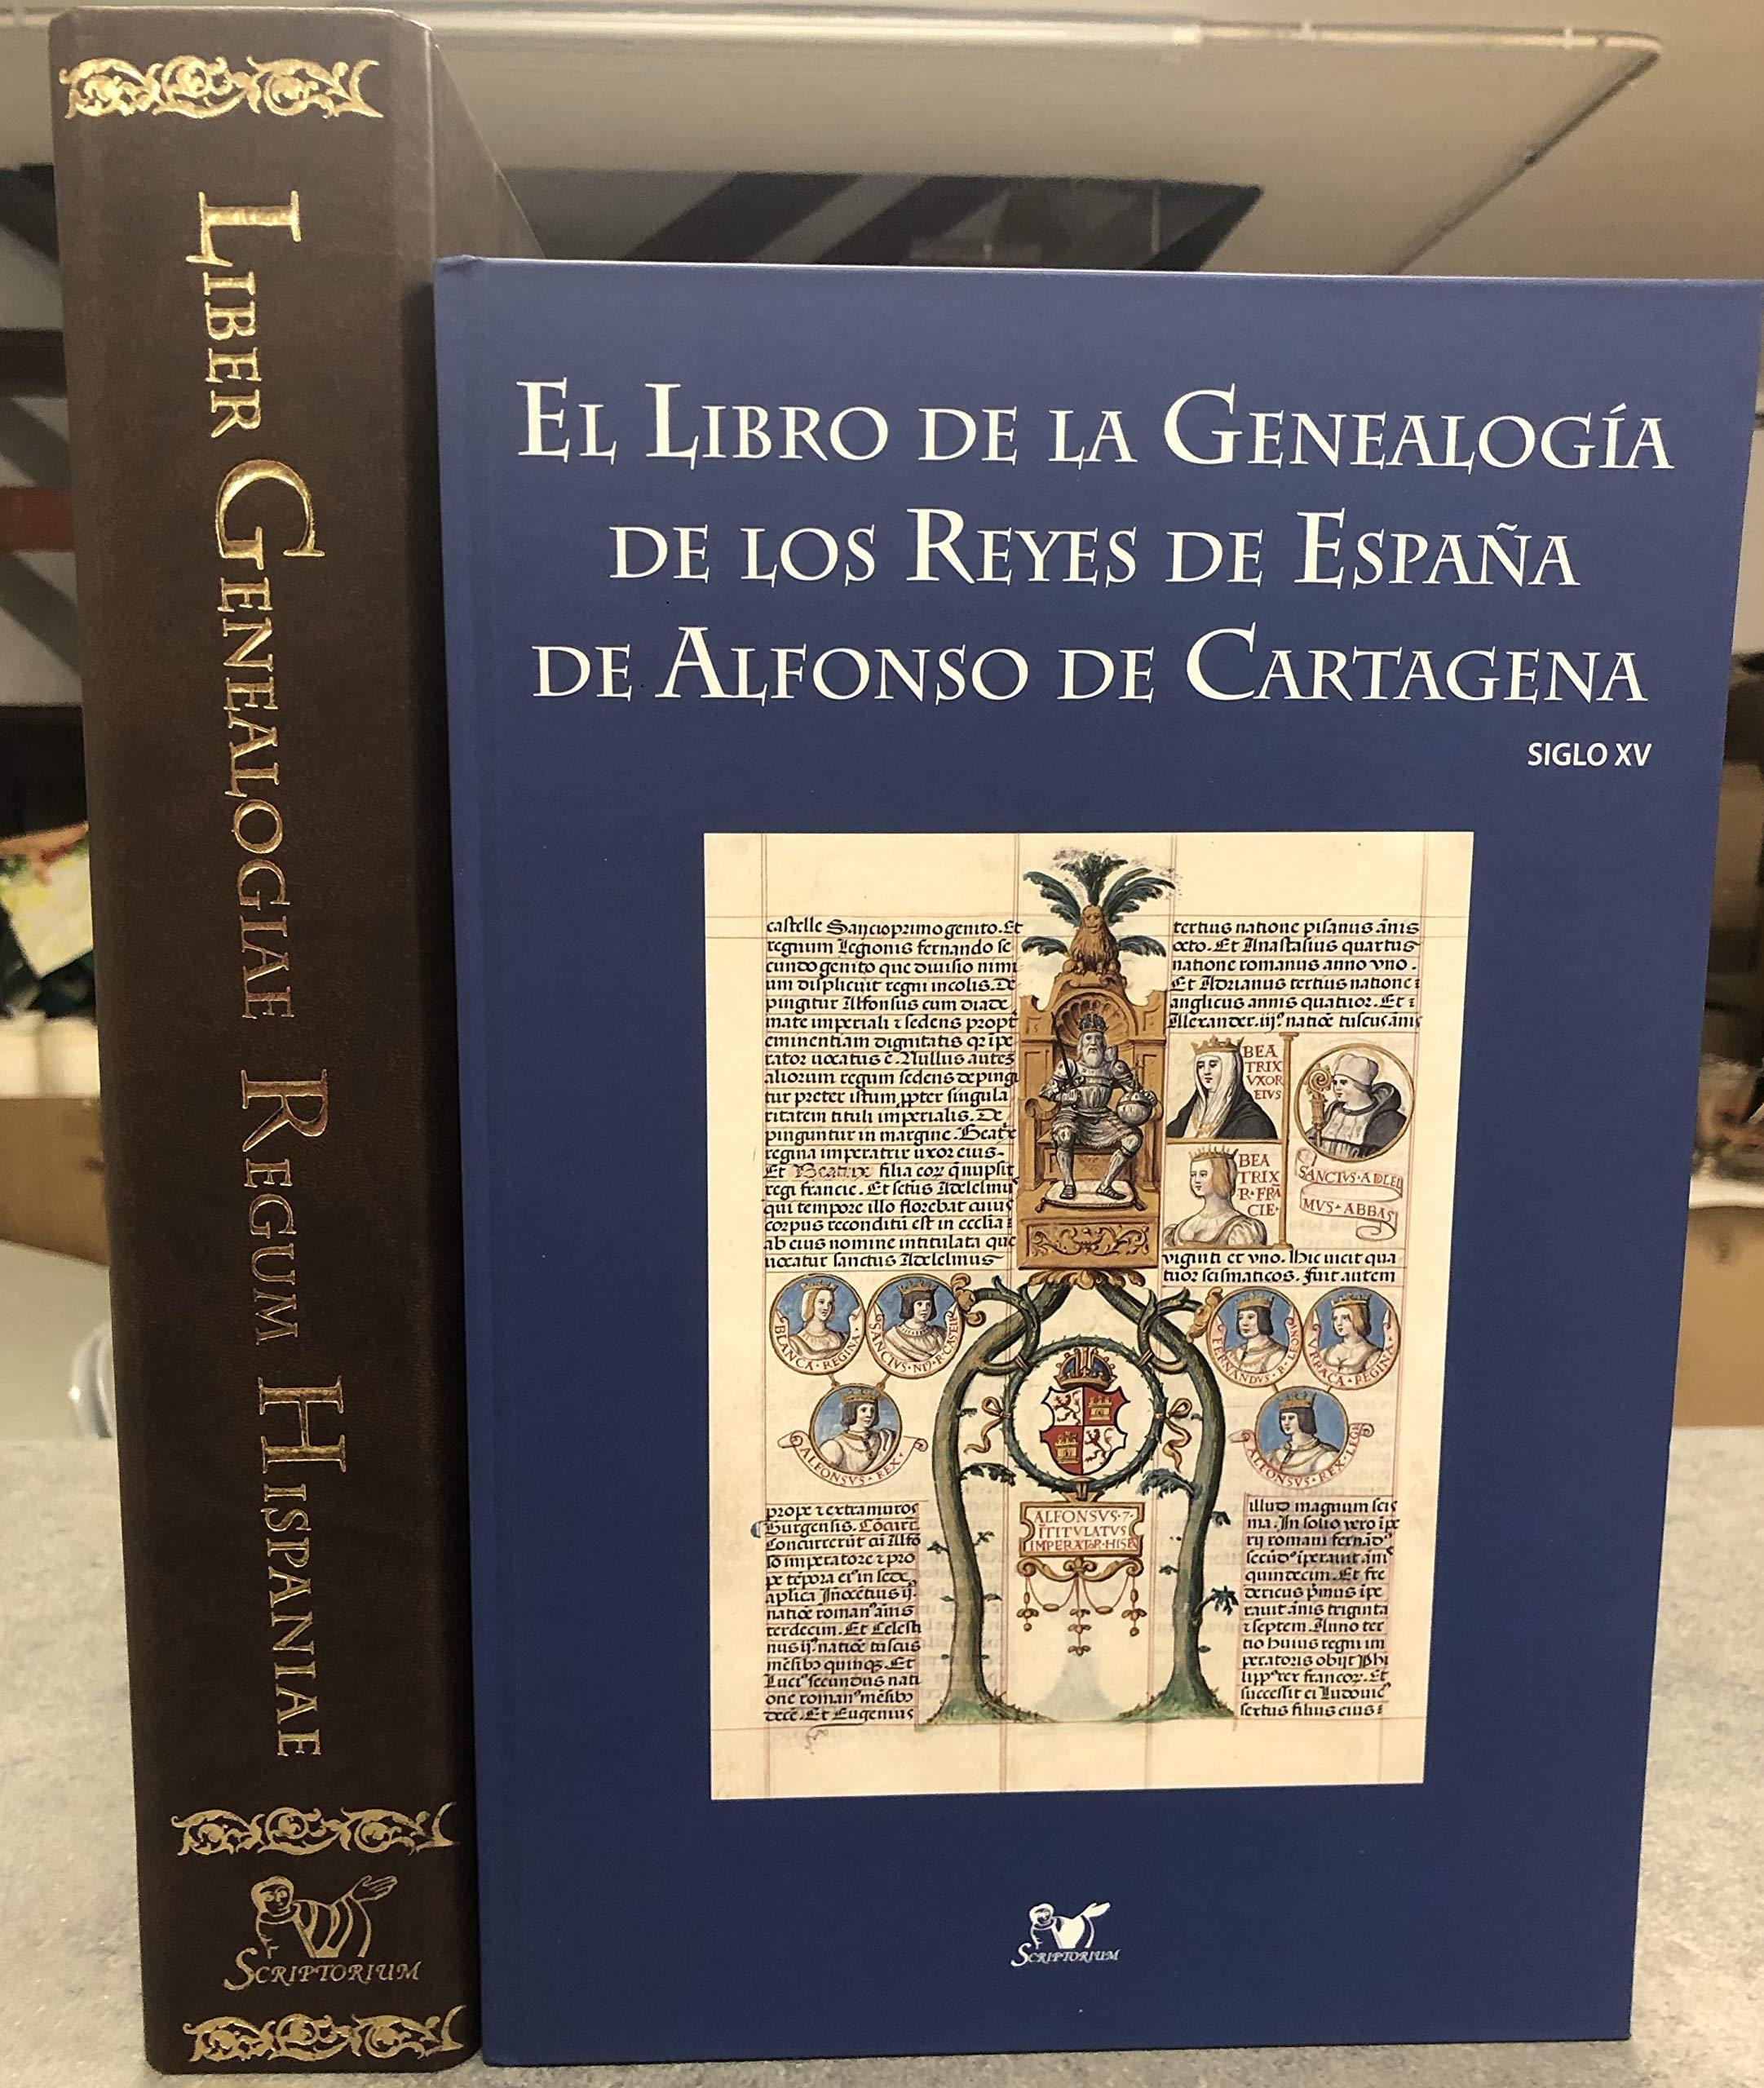 LIBER GENEALOGIE REGUM HISPANIAE: GENEALOGIA DE LOS REYES DE ...